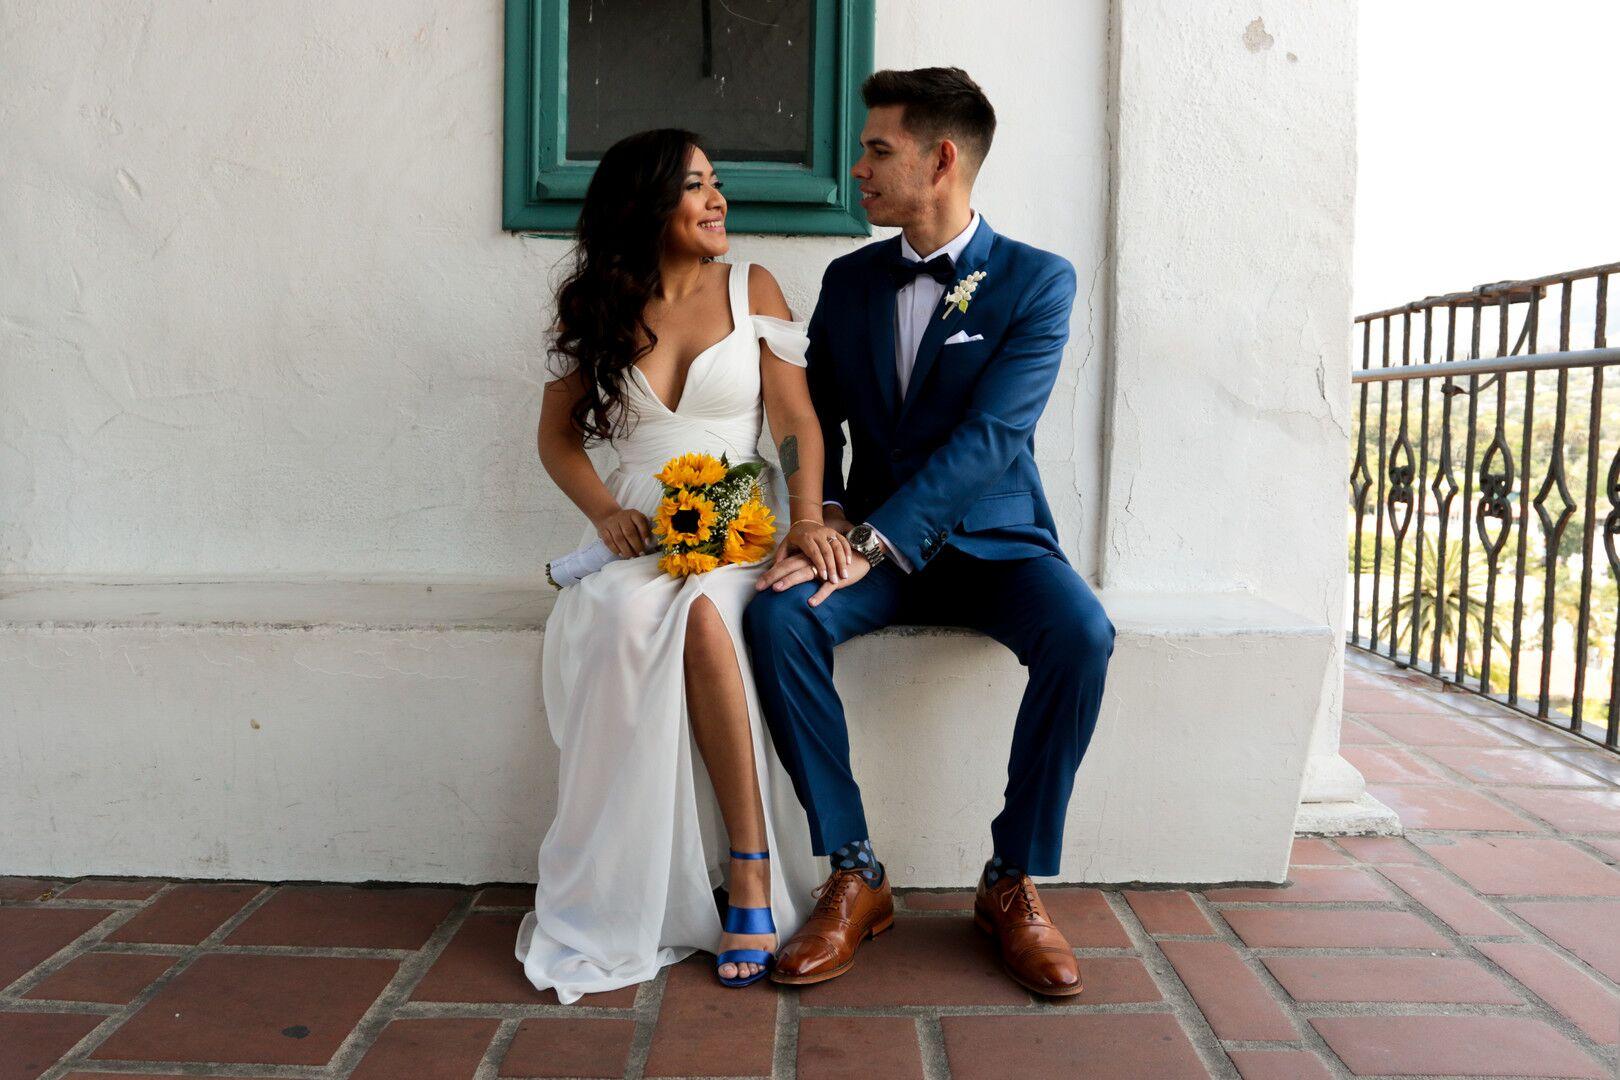 www.santabarbaraweddings.com | Photographer: Trista Maja Photography | Venue: Santa Barbara Courthouse | Wedding Dress: Lulus | Hair: Legends Hair | Bride and Groom Sweet Moment